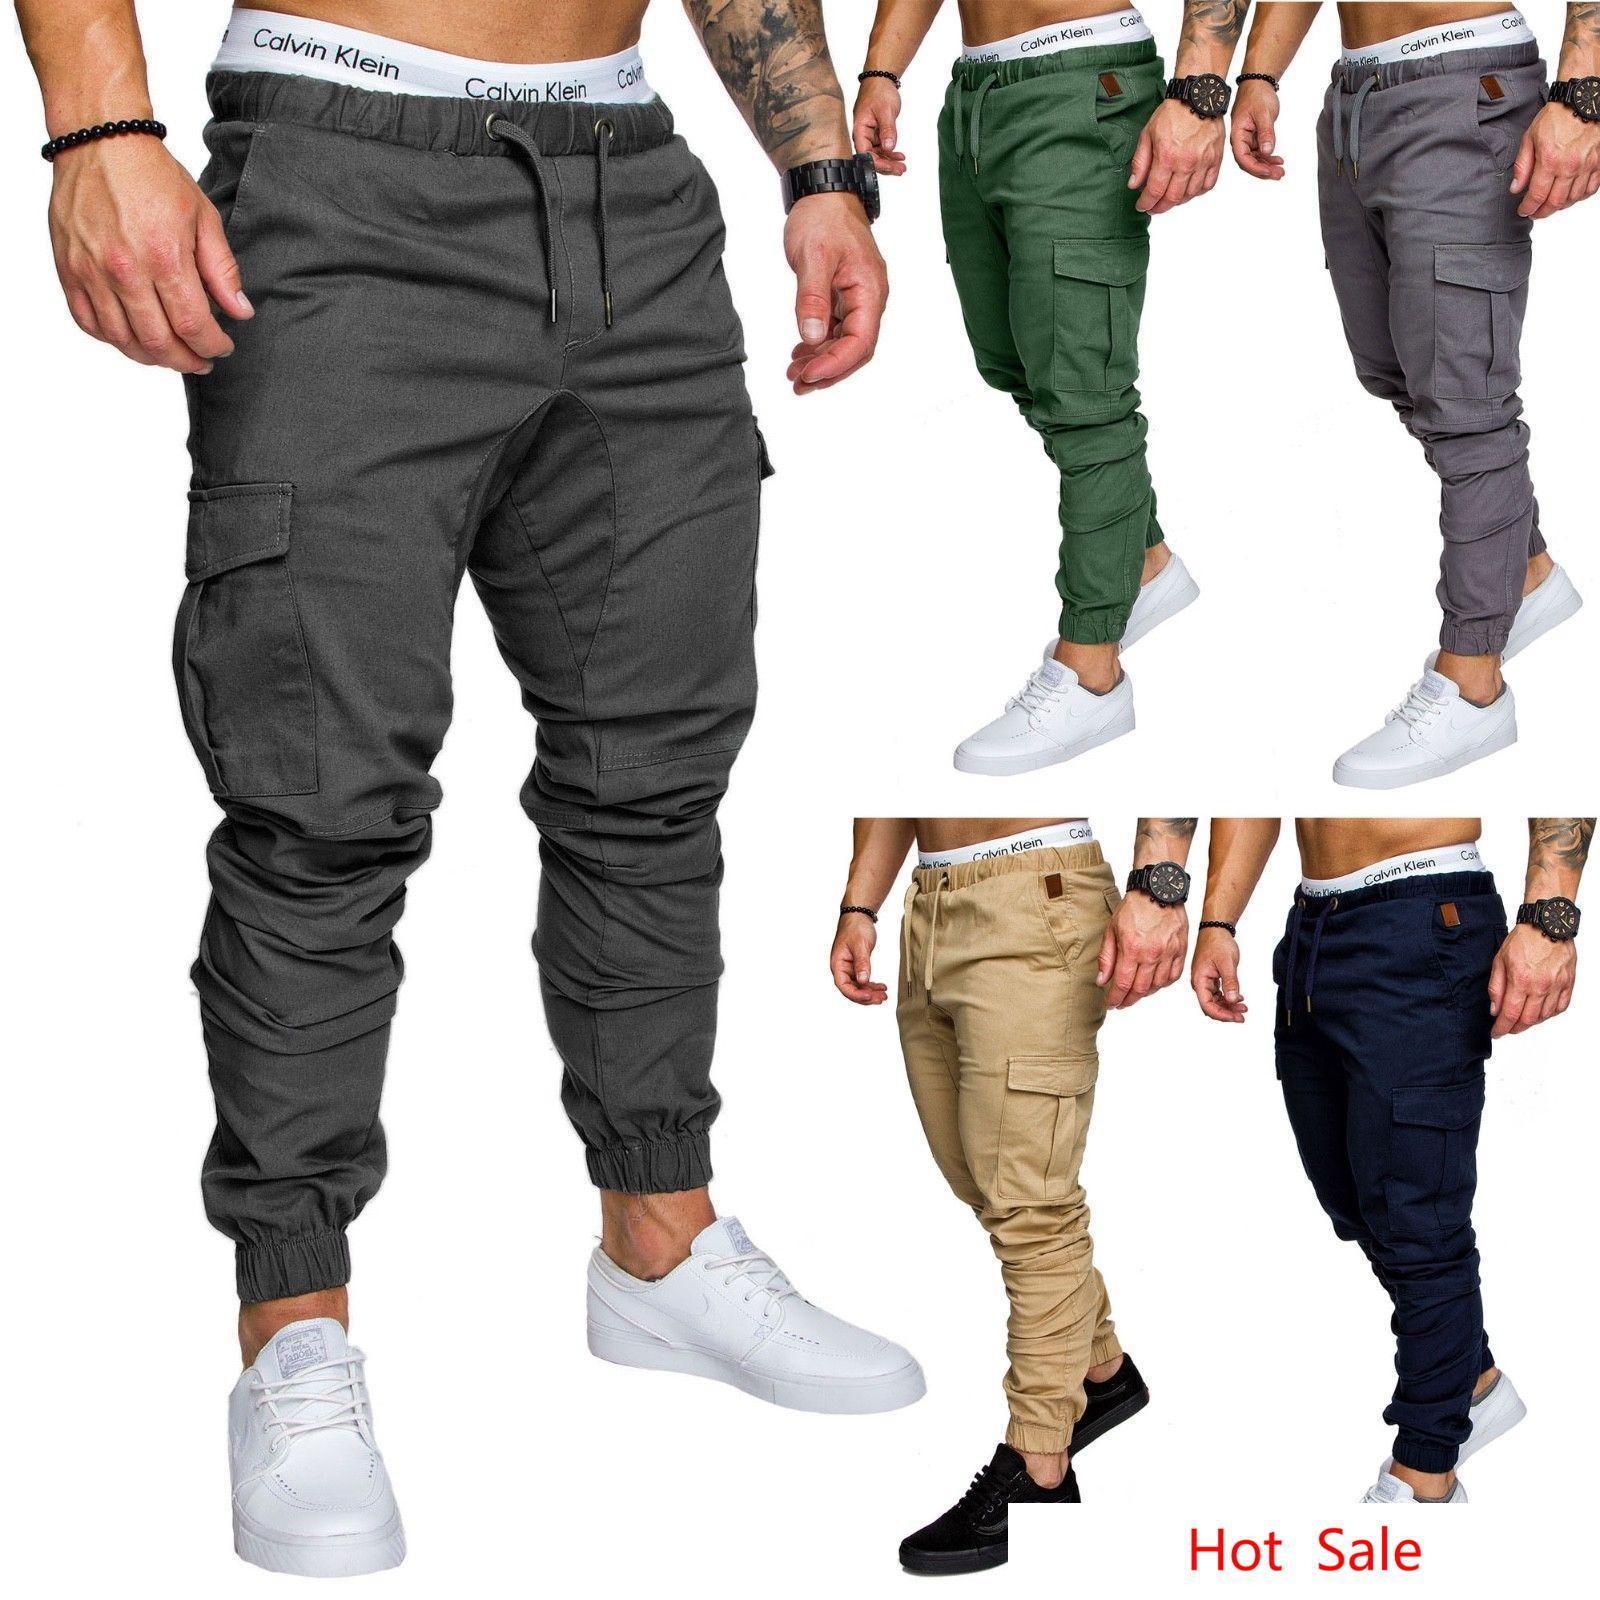 Erkekler Harem Pantolon Gevşek Fit Pantolon Pamuk Elastik Bel Uzun Pantolon Jogging Yapan Pantolon Sweatpants Sıska Kalem Pantolon M-4XL